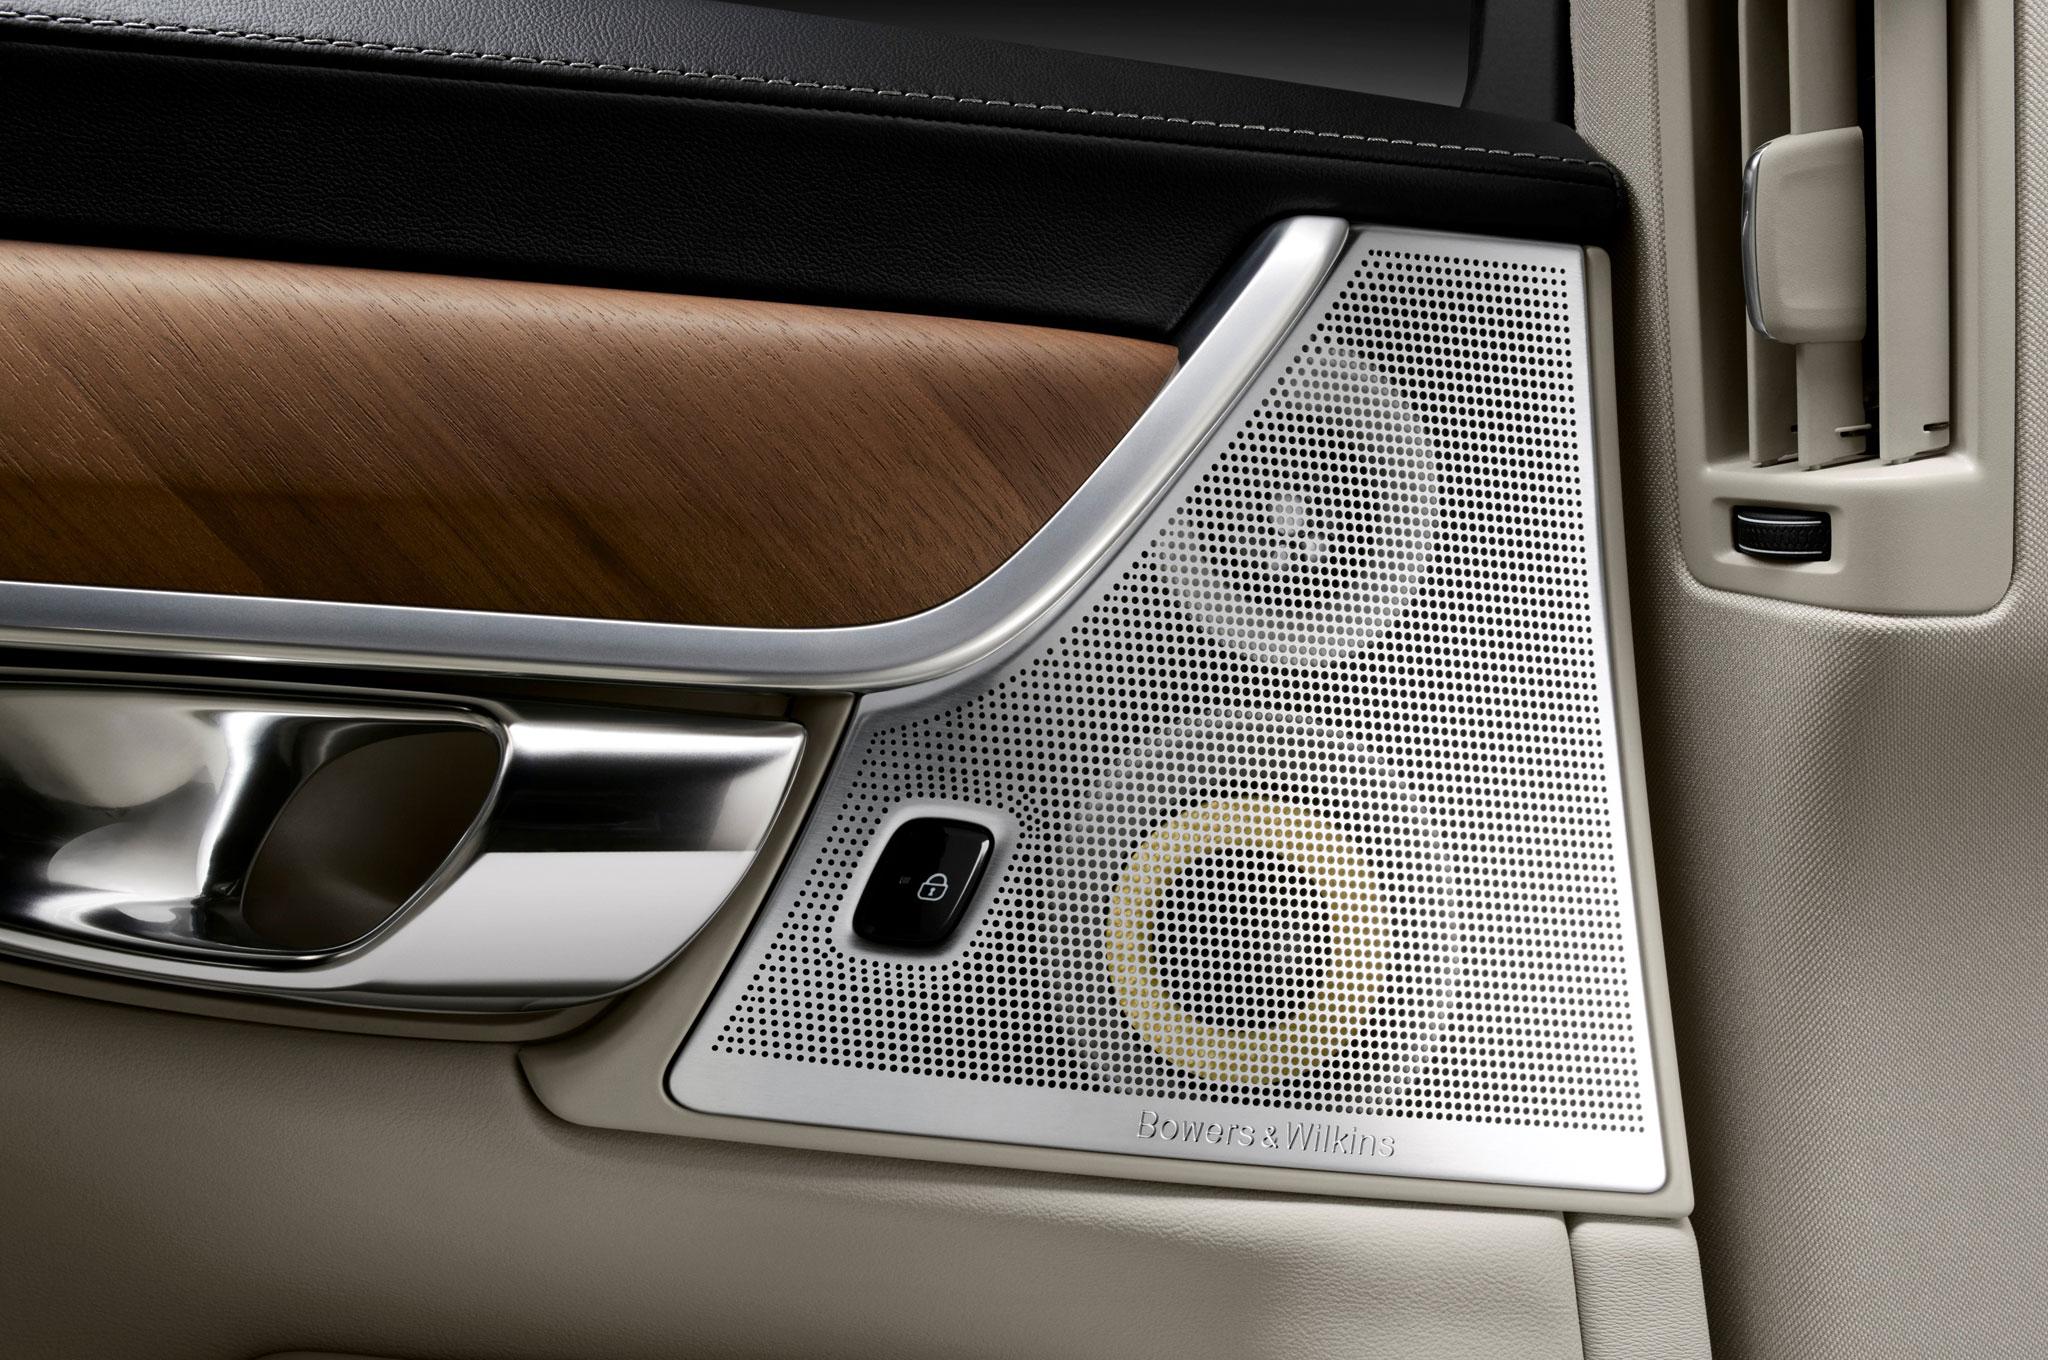 Take a look inside the 2017 volvo s90 luxury sedan for Interior back doors